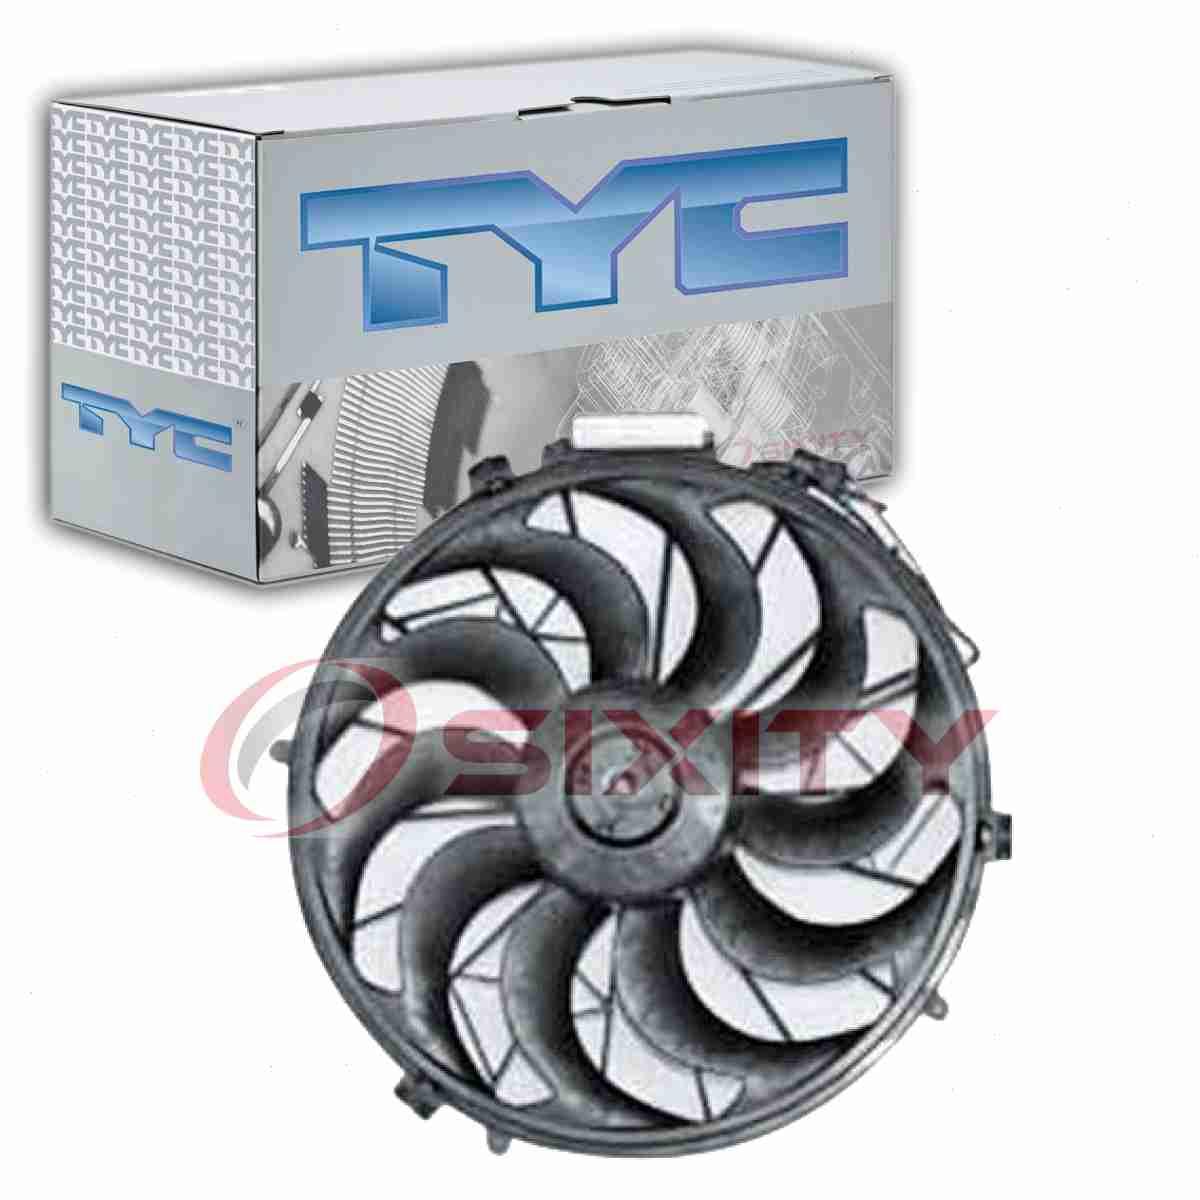 TYC 611360 AC Condenser Fan Assembly for 620-281 HO3113131 HD61061A Dorman vk